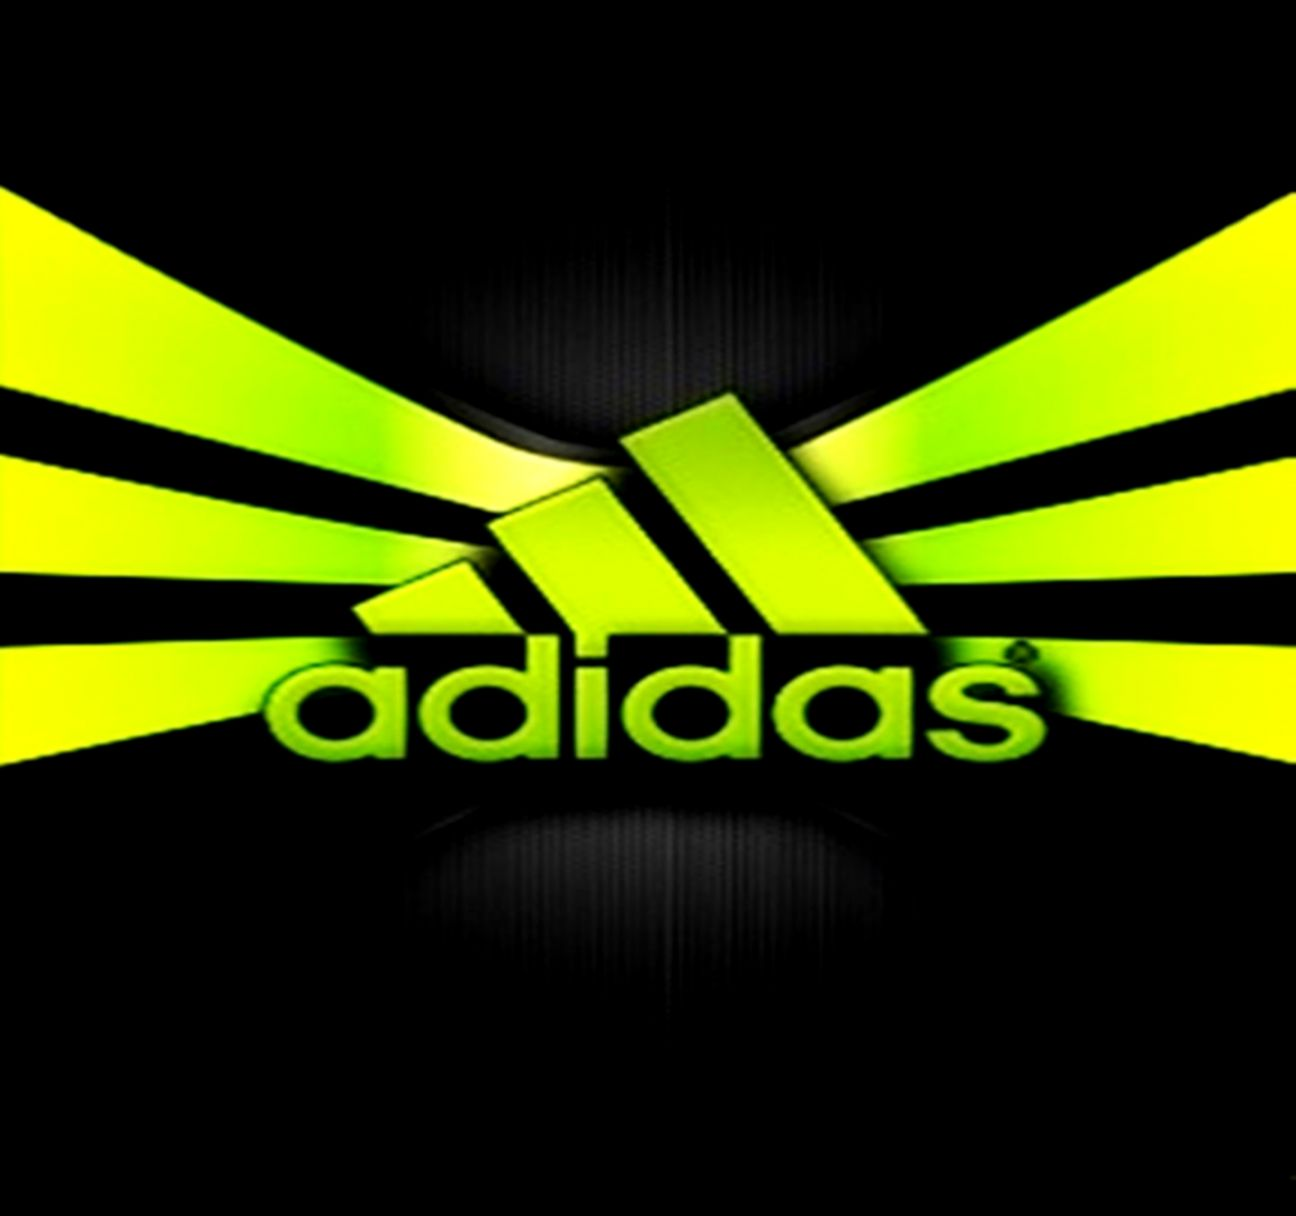 green adidas logo wallpapers wallpaper cave